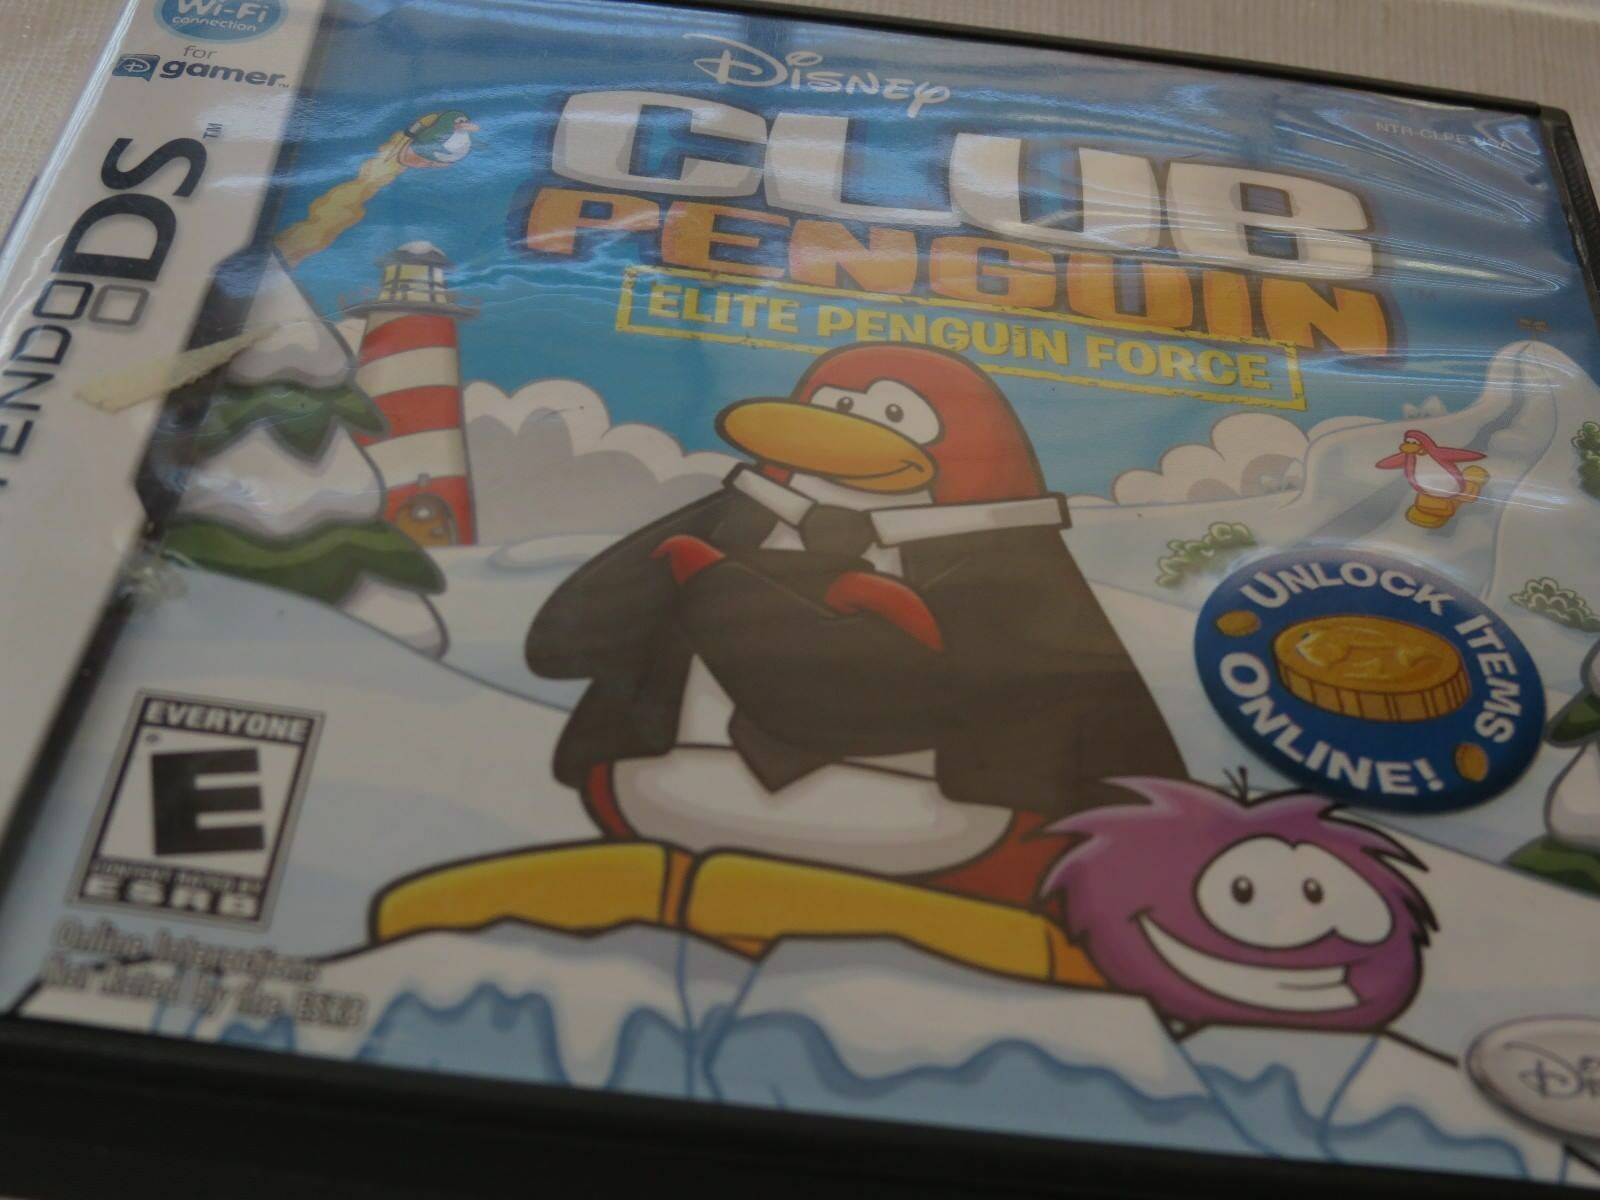 Club Penguin : Elite Penguin Force (Nintendo DS, 2008) Disney Game Boy Everyone